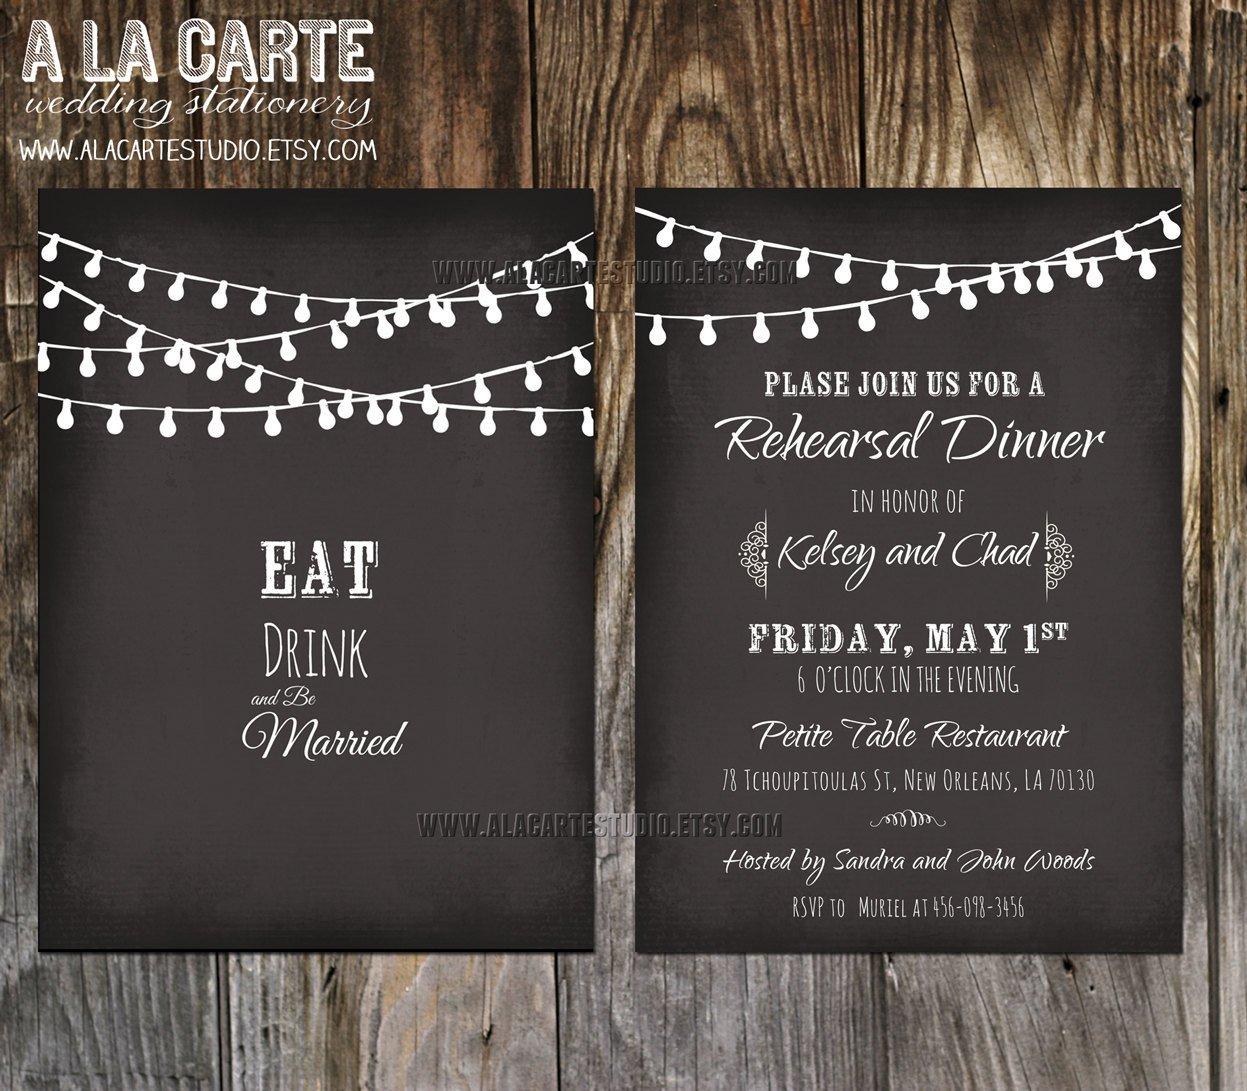 Chalkboard Invitation Template Free Chalkboard Wedding Invitation Templates